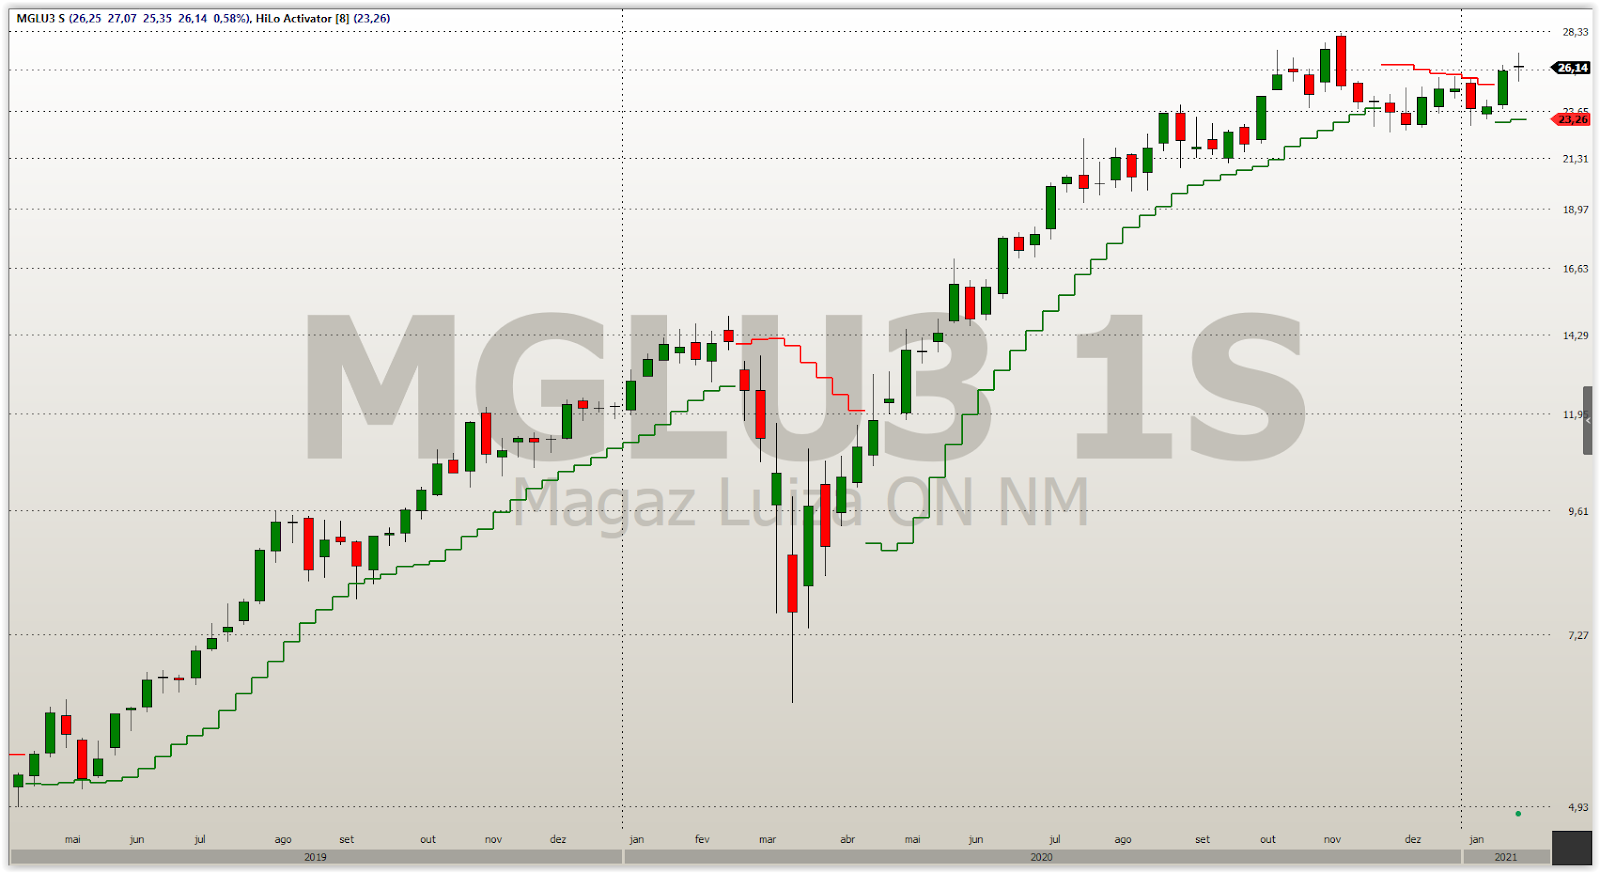 Utilizando HiLo para Position Trade: MGLU3 Gráfico Semanal. 8 Períodos.